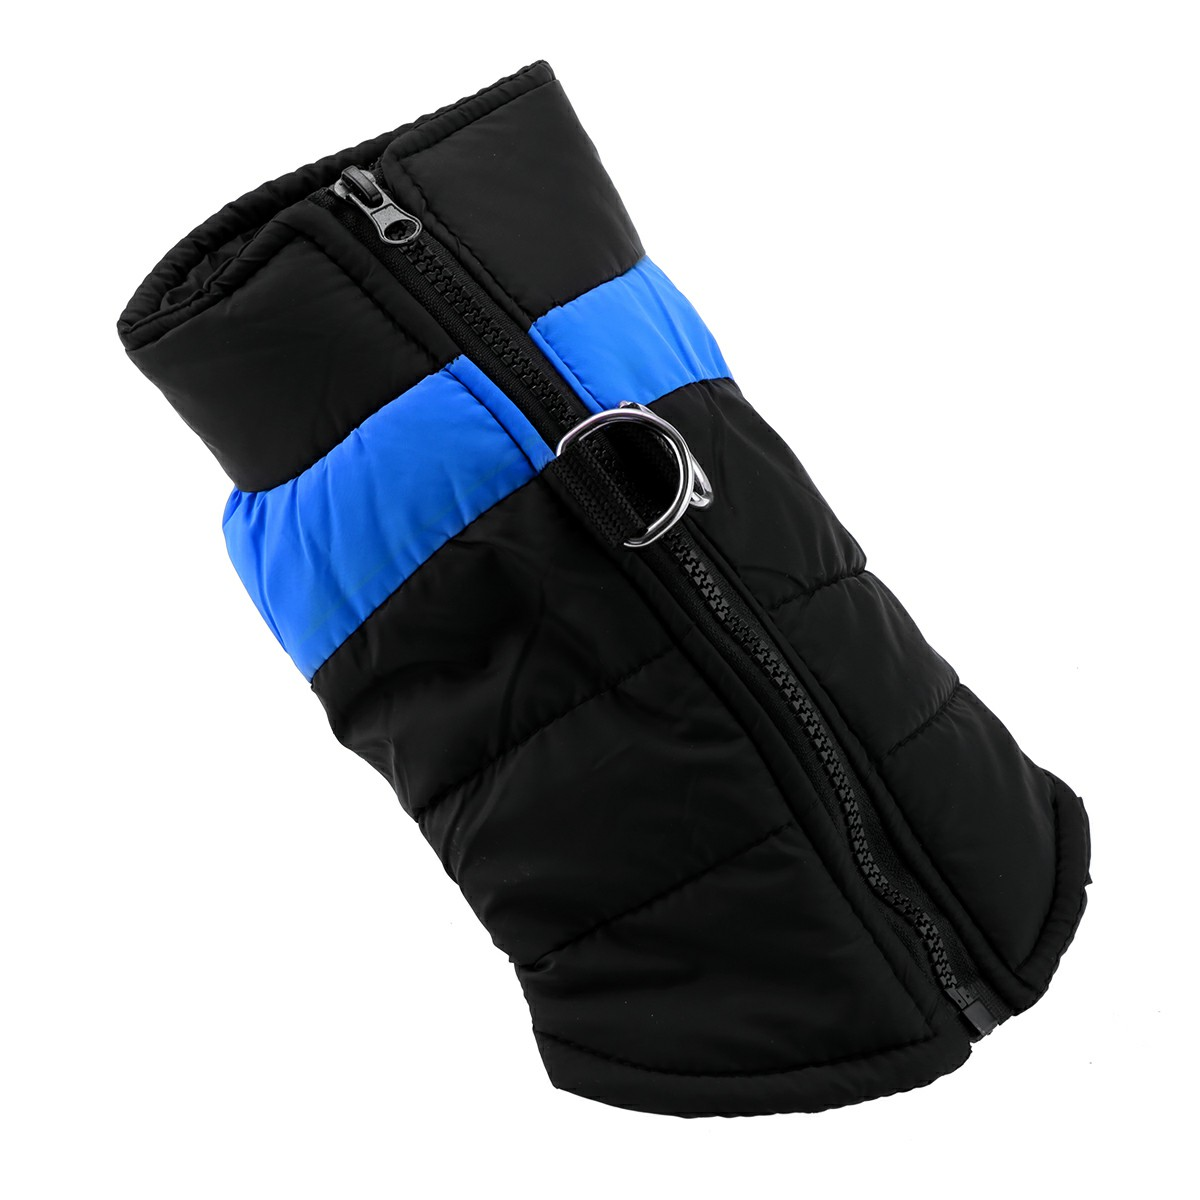 Comfy Soft Dog Vest Jacket Winter Waterproof Padded Pet Clothes Warm Vest Coat Size XL - Blue